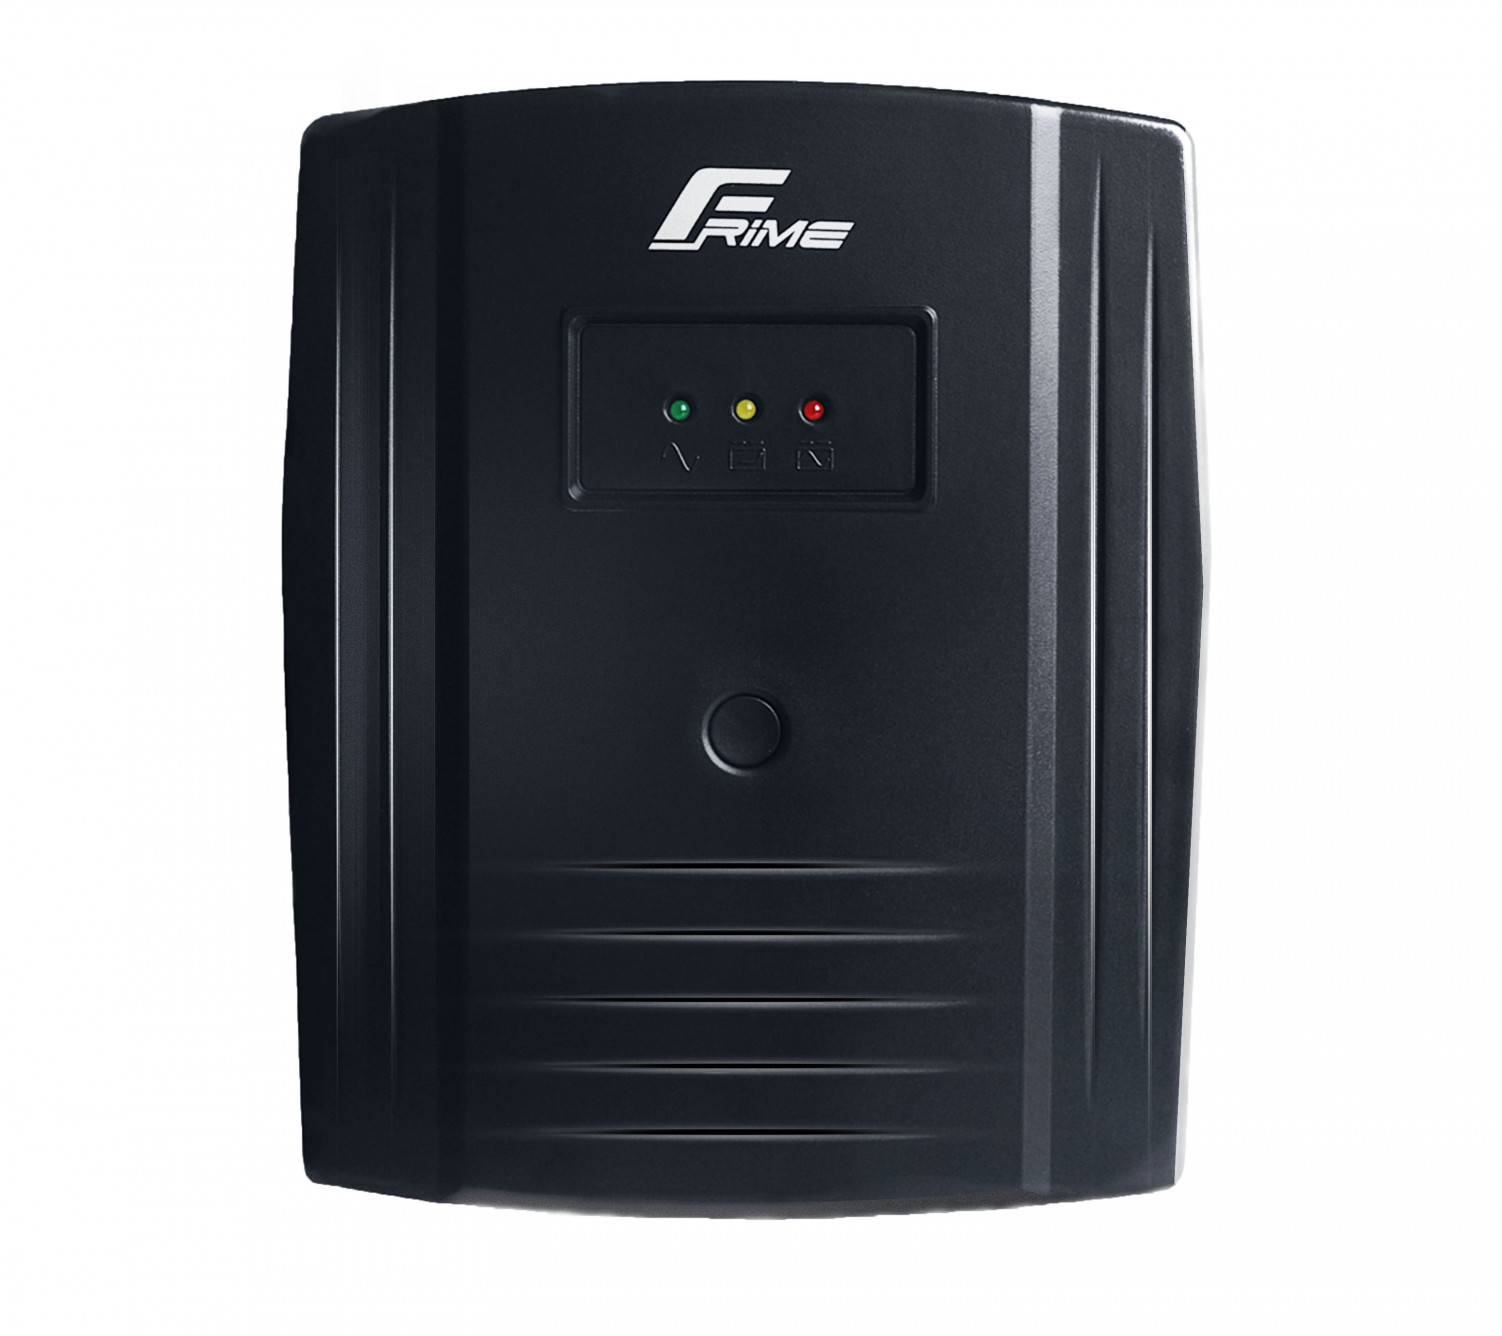 ИБП Frime Standart 850VA